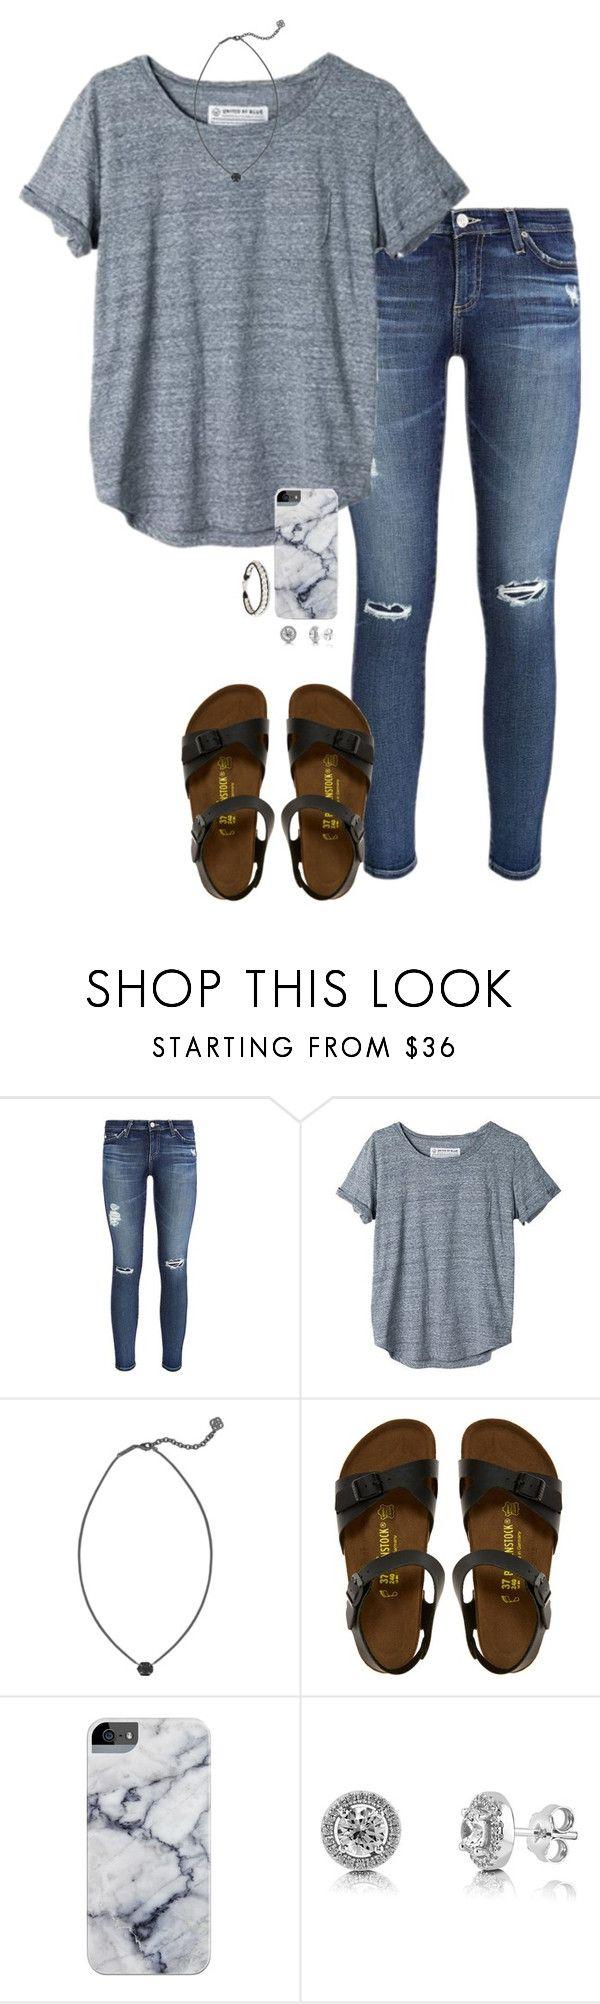 t-shirt, jeansbroek, sandalen, armband, ketting